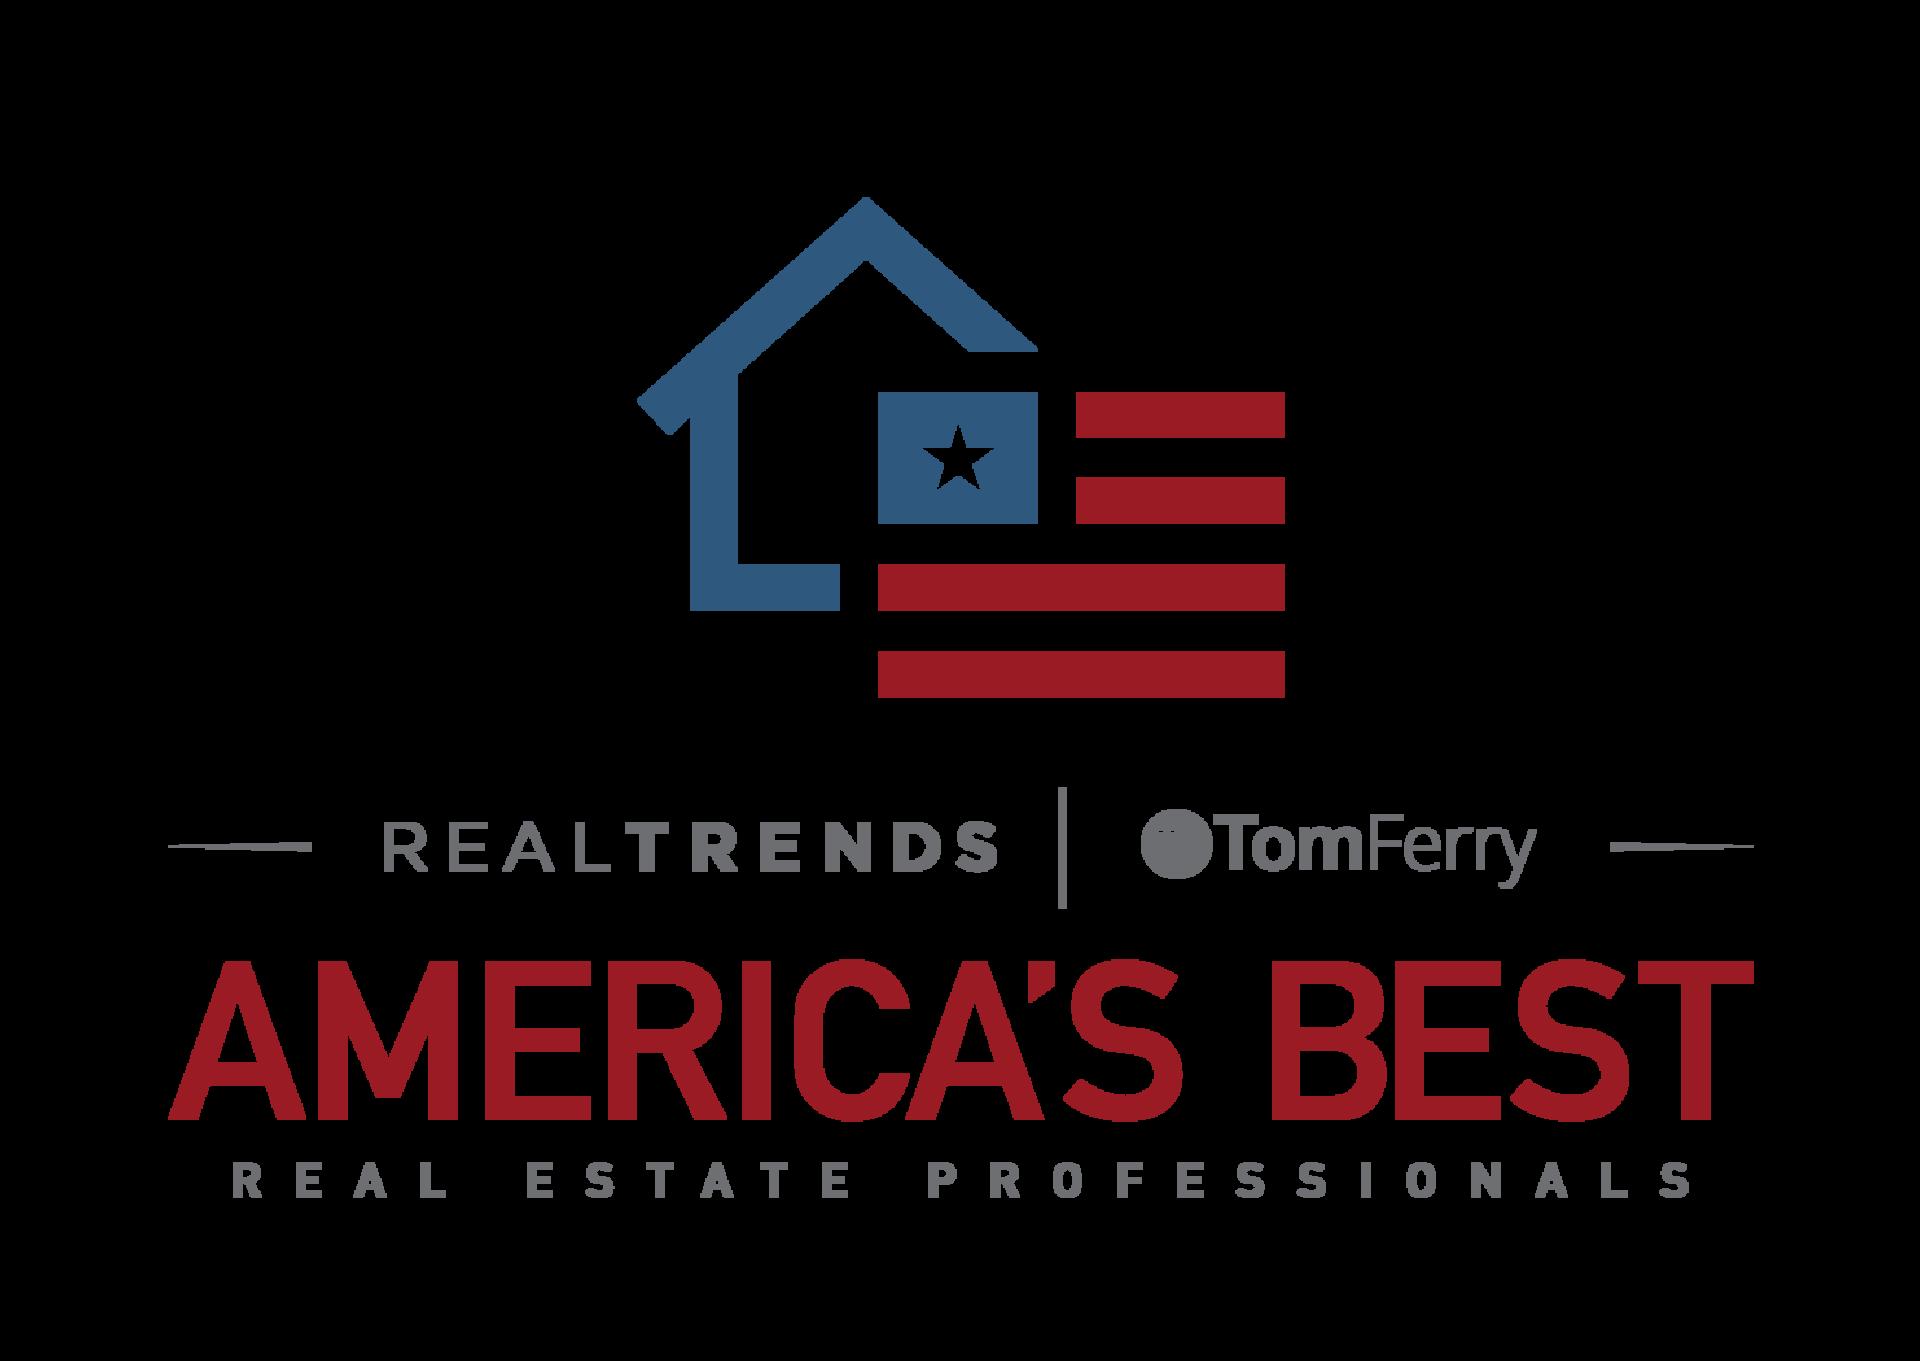 Americas Best List_Texas